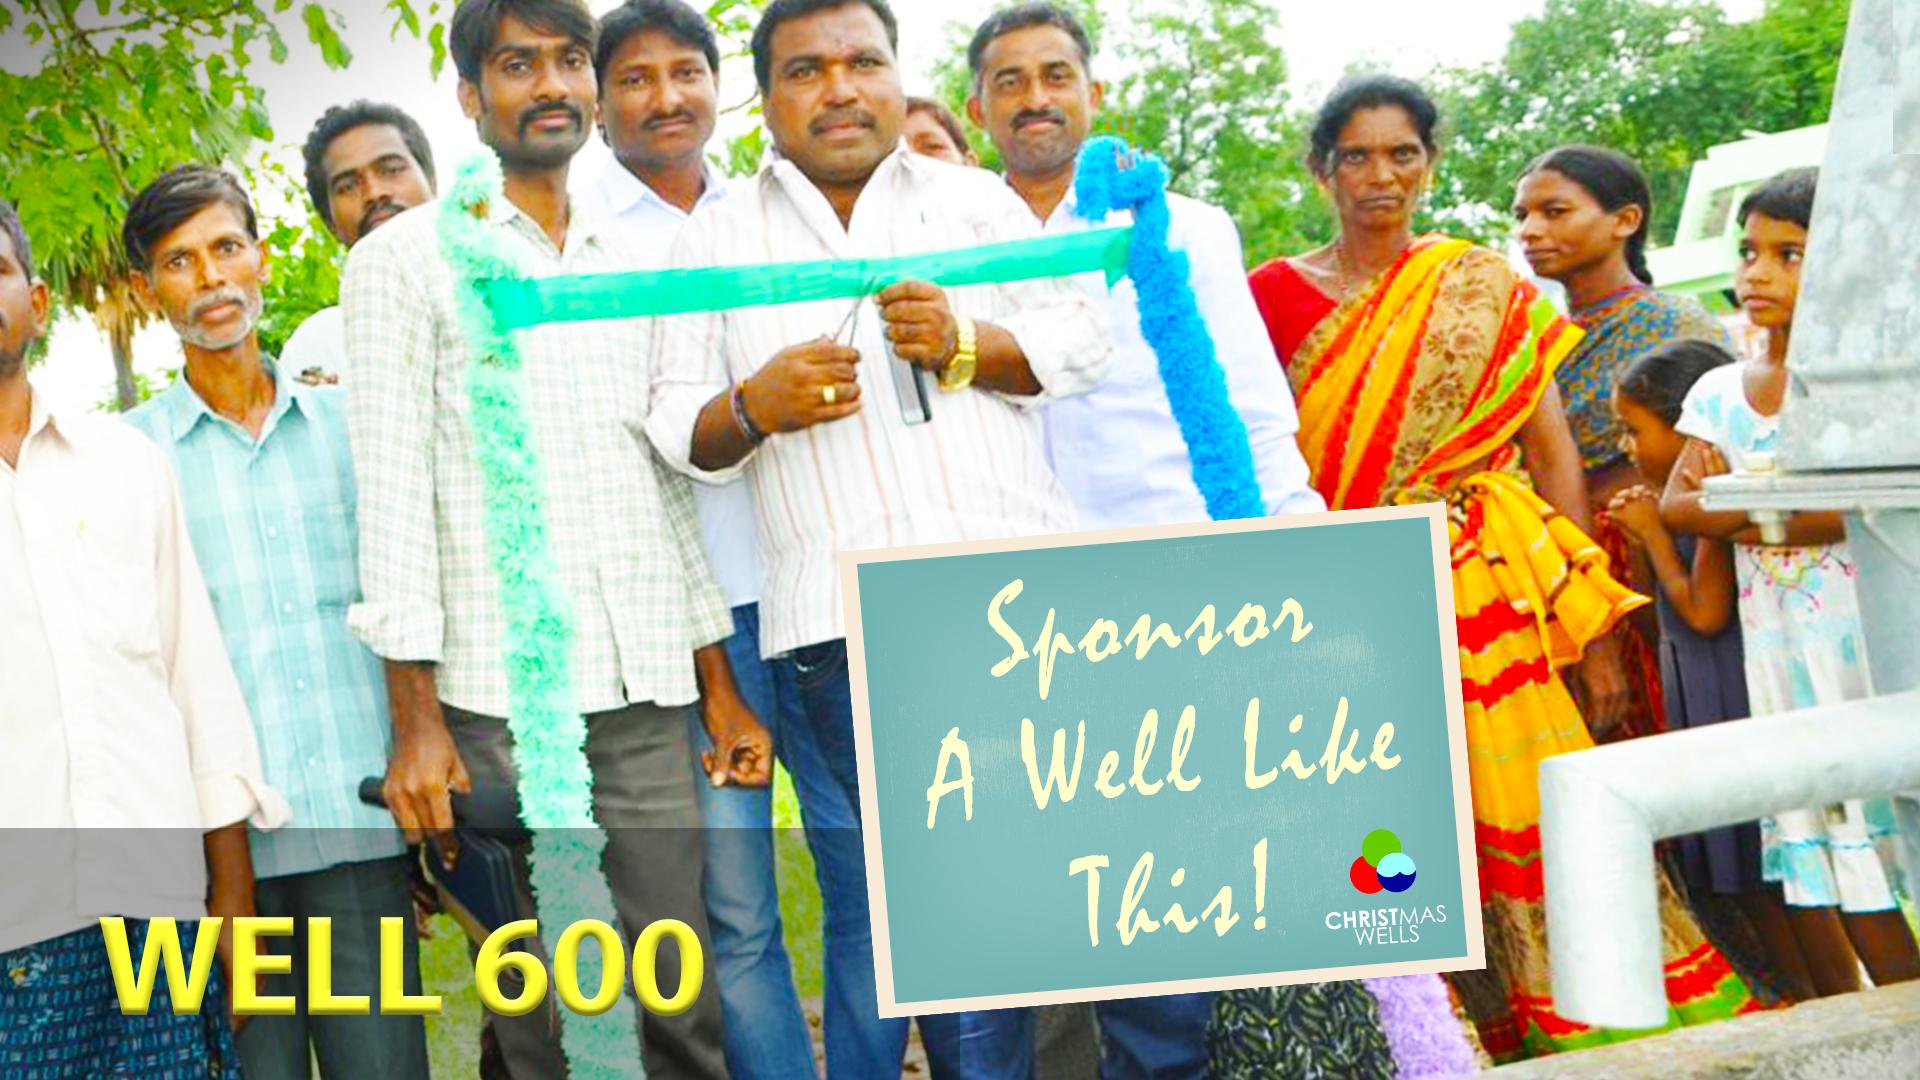 600_Wells-Set_2016-02_India_1920x1080.jpg